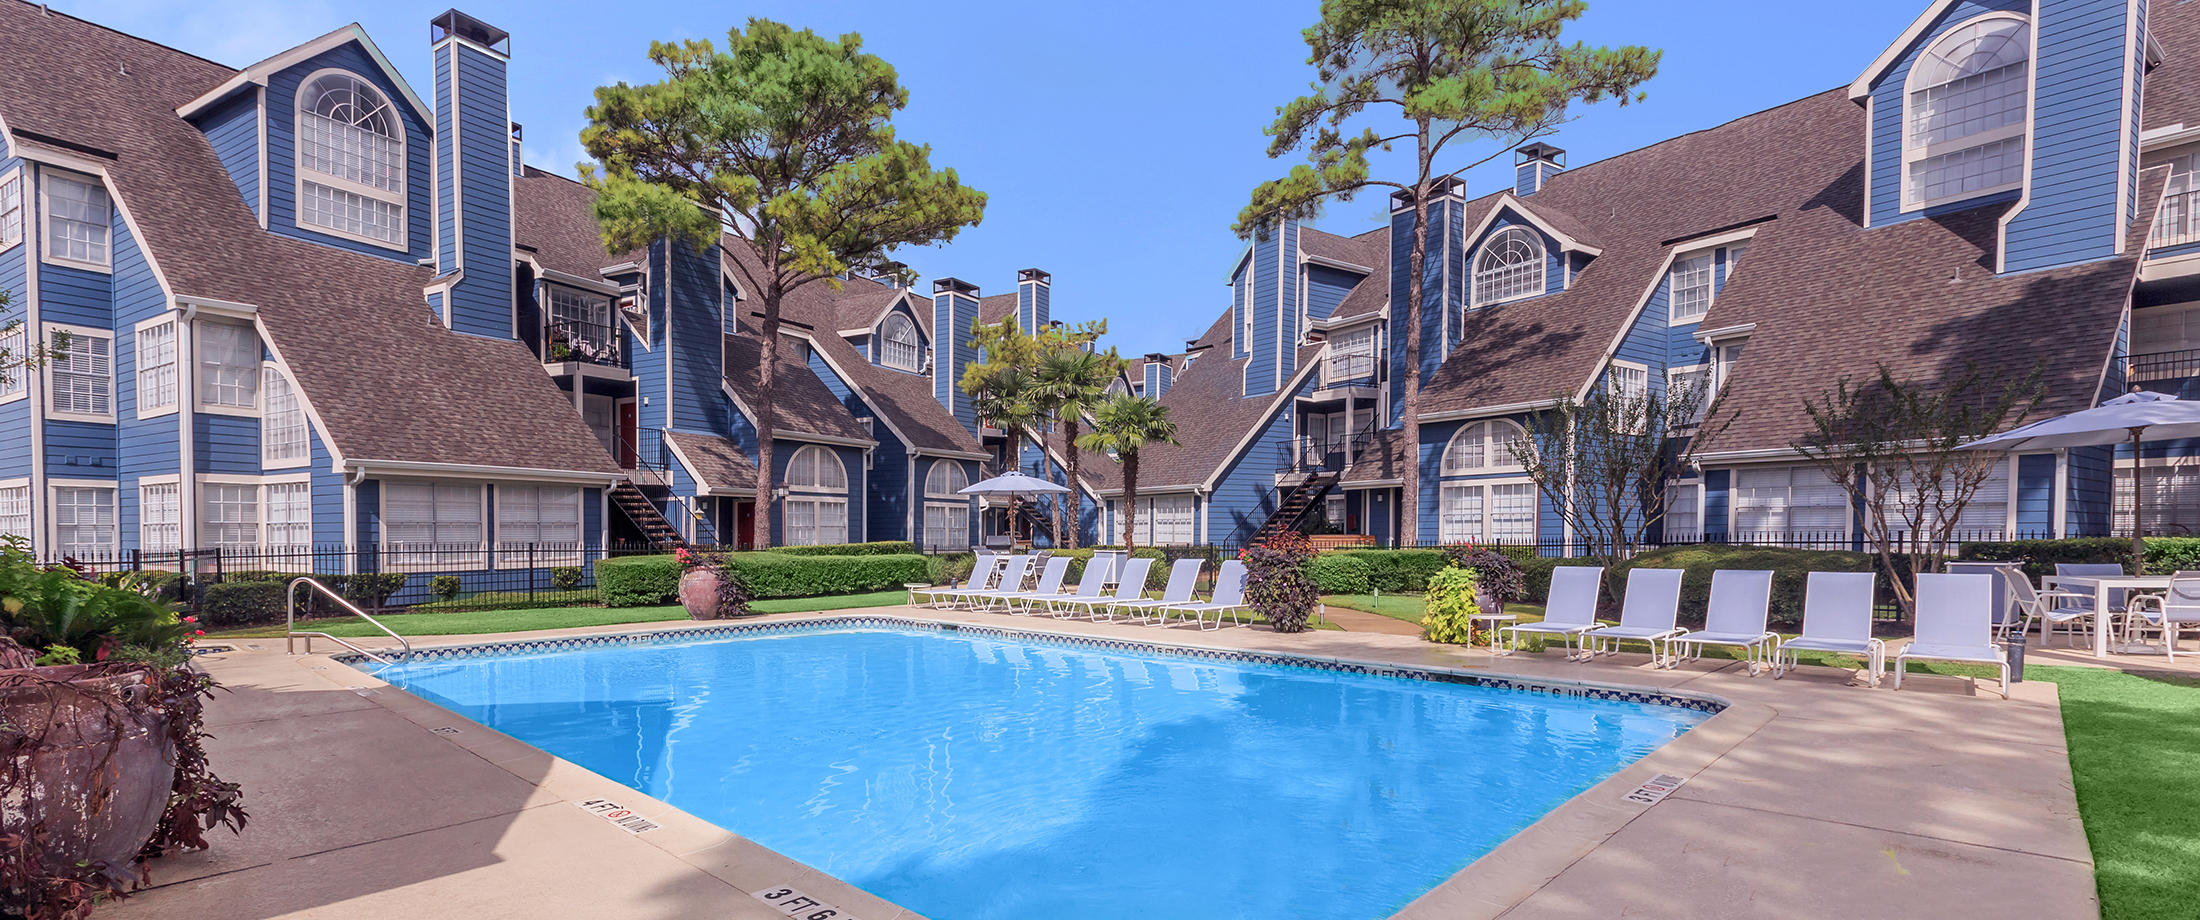 Brant Rock Apartments in Houston TX